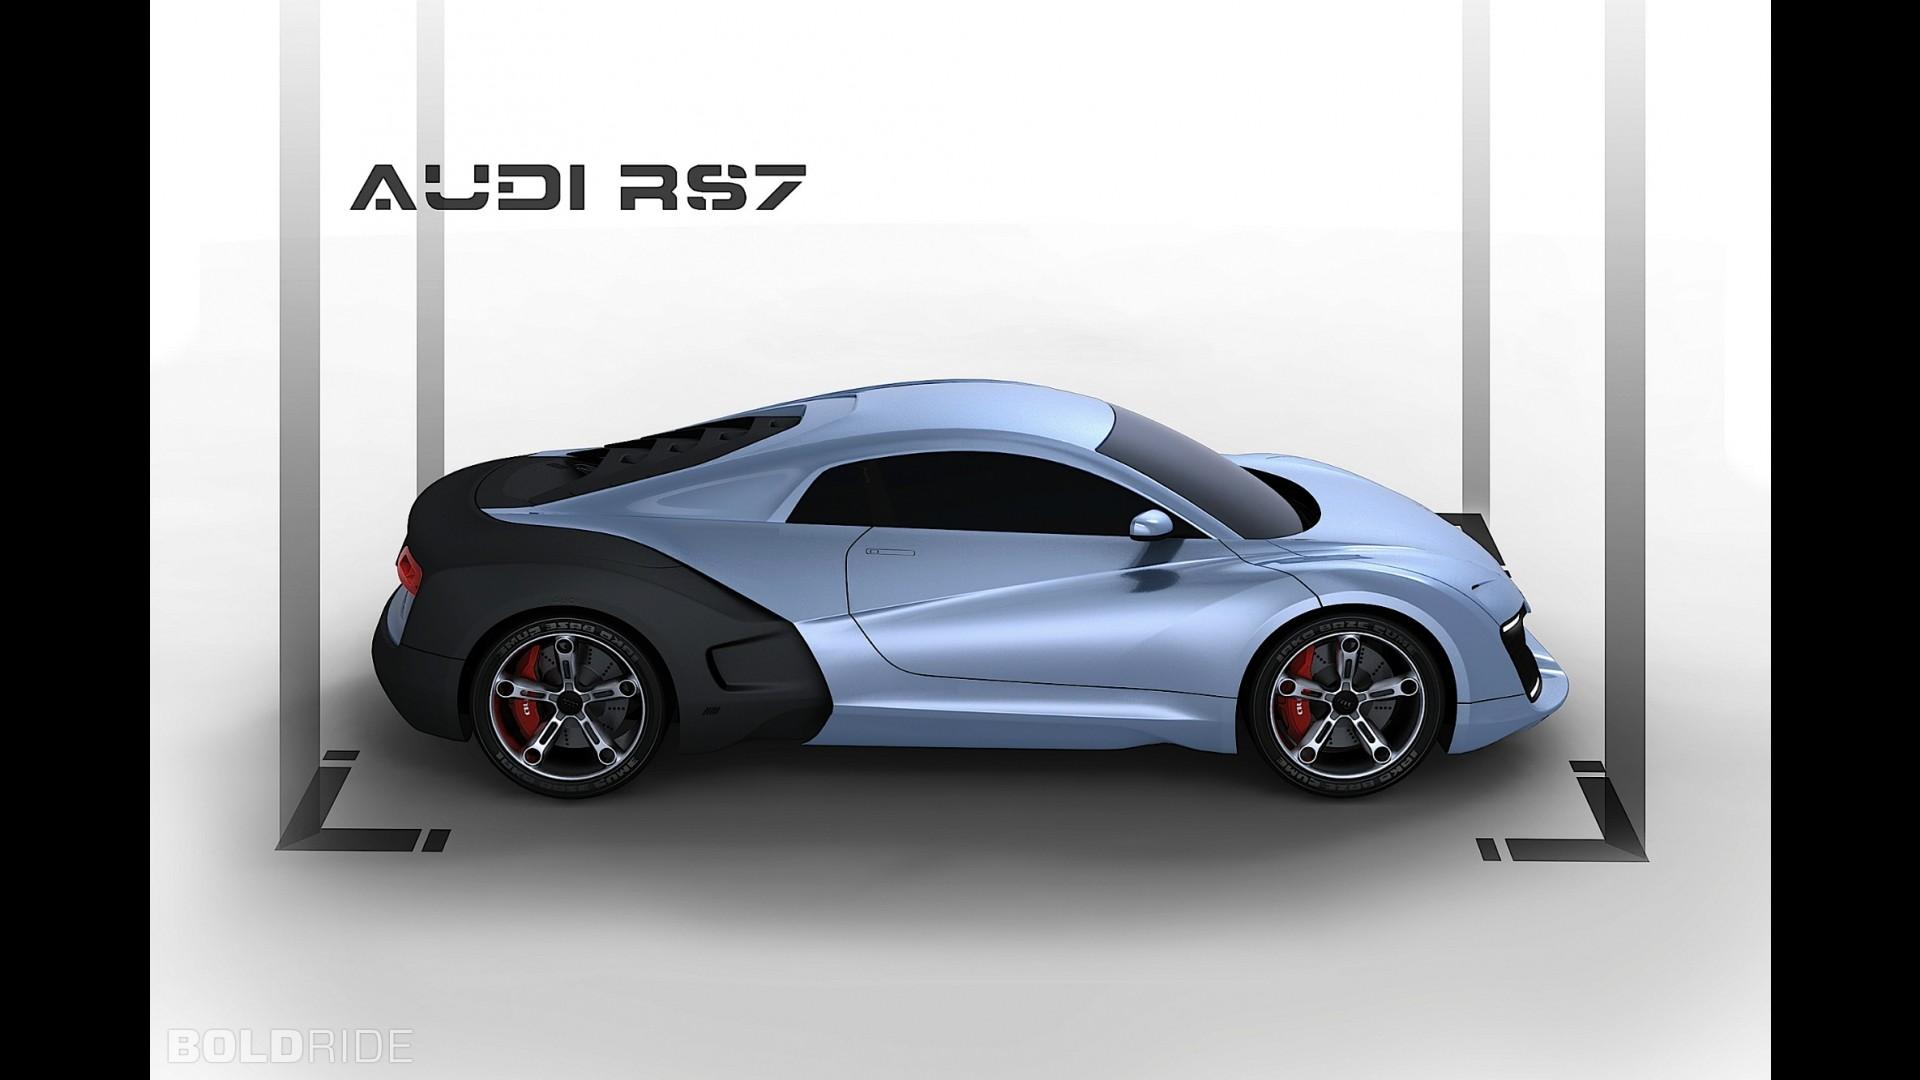 Audi RS7 Concept by Adriano Mudri